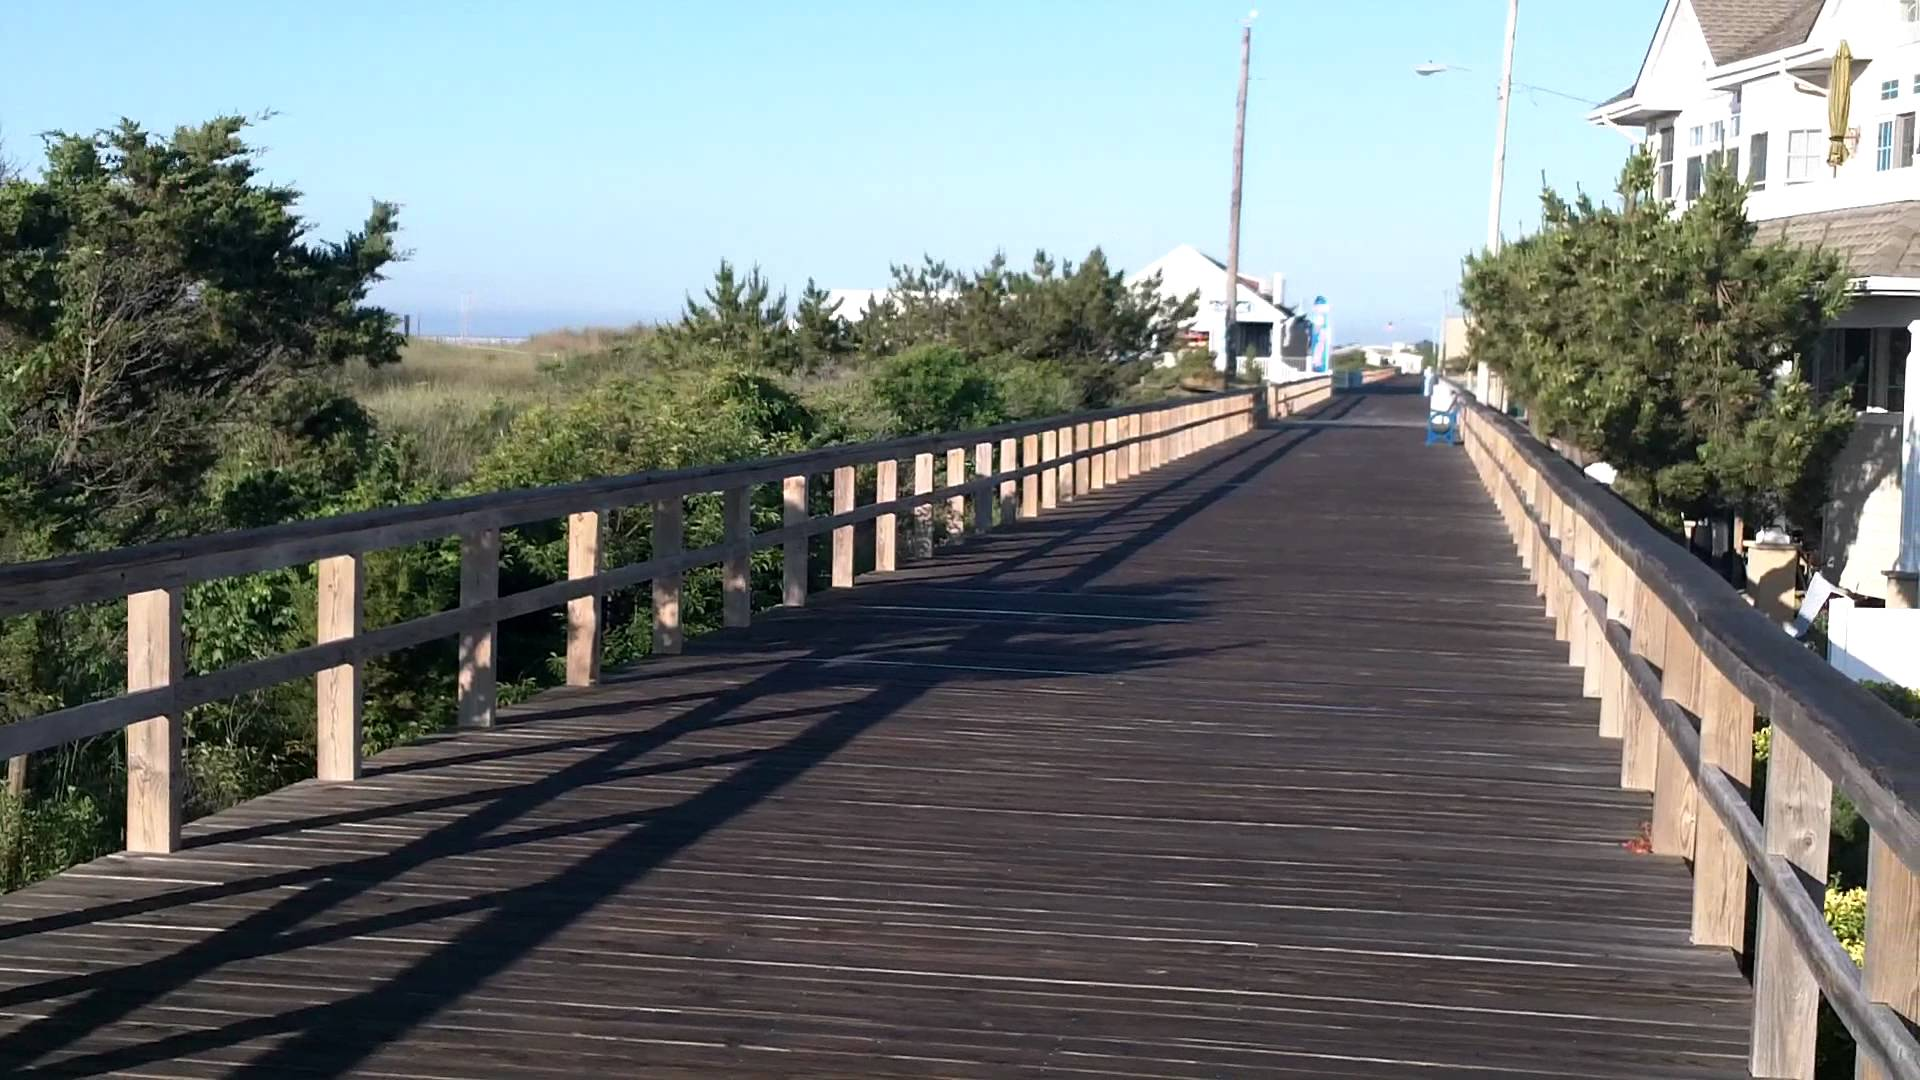 Avalon's boardwalk